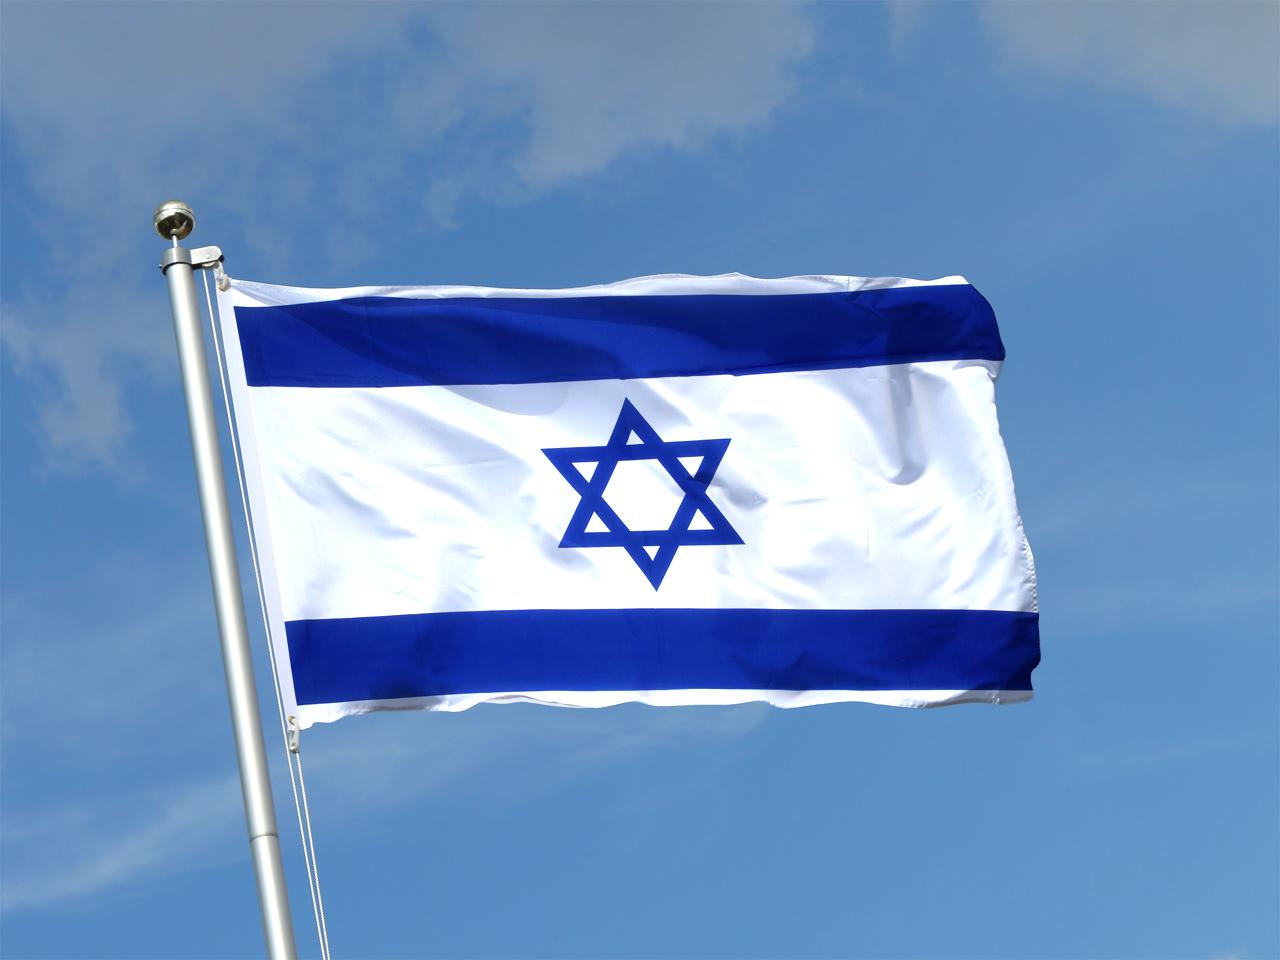 israel flagge kaufen 90 x 150 cm flaggenplatz online shop. Black Bedroom Furniture Sets. Home Design Ideas